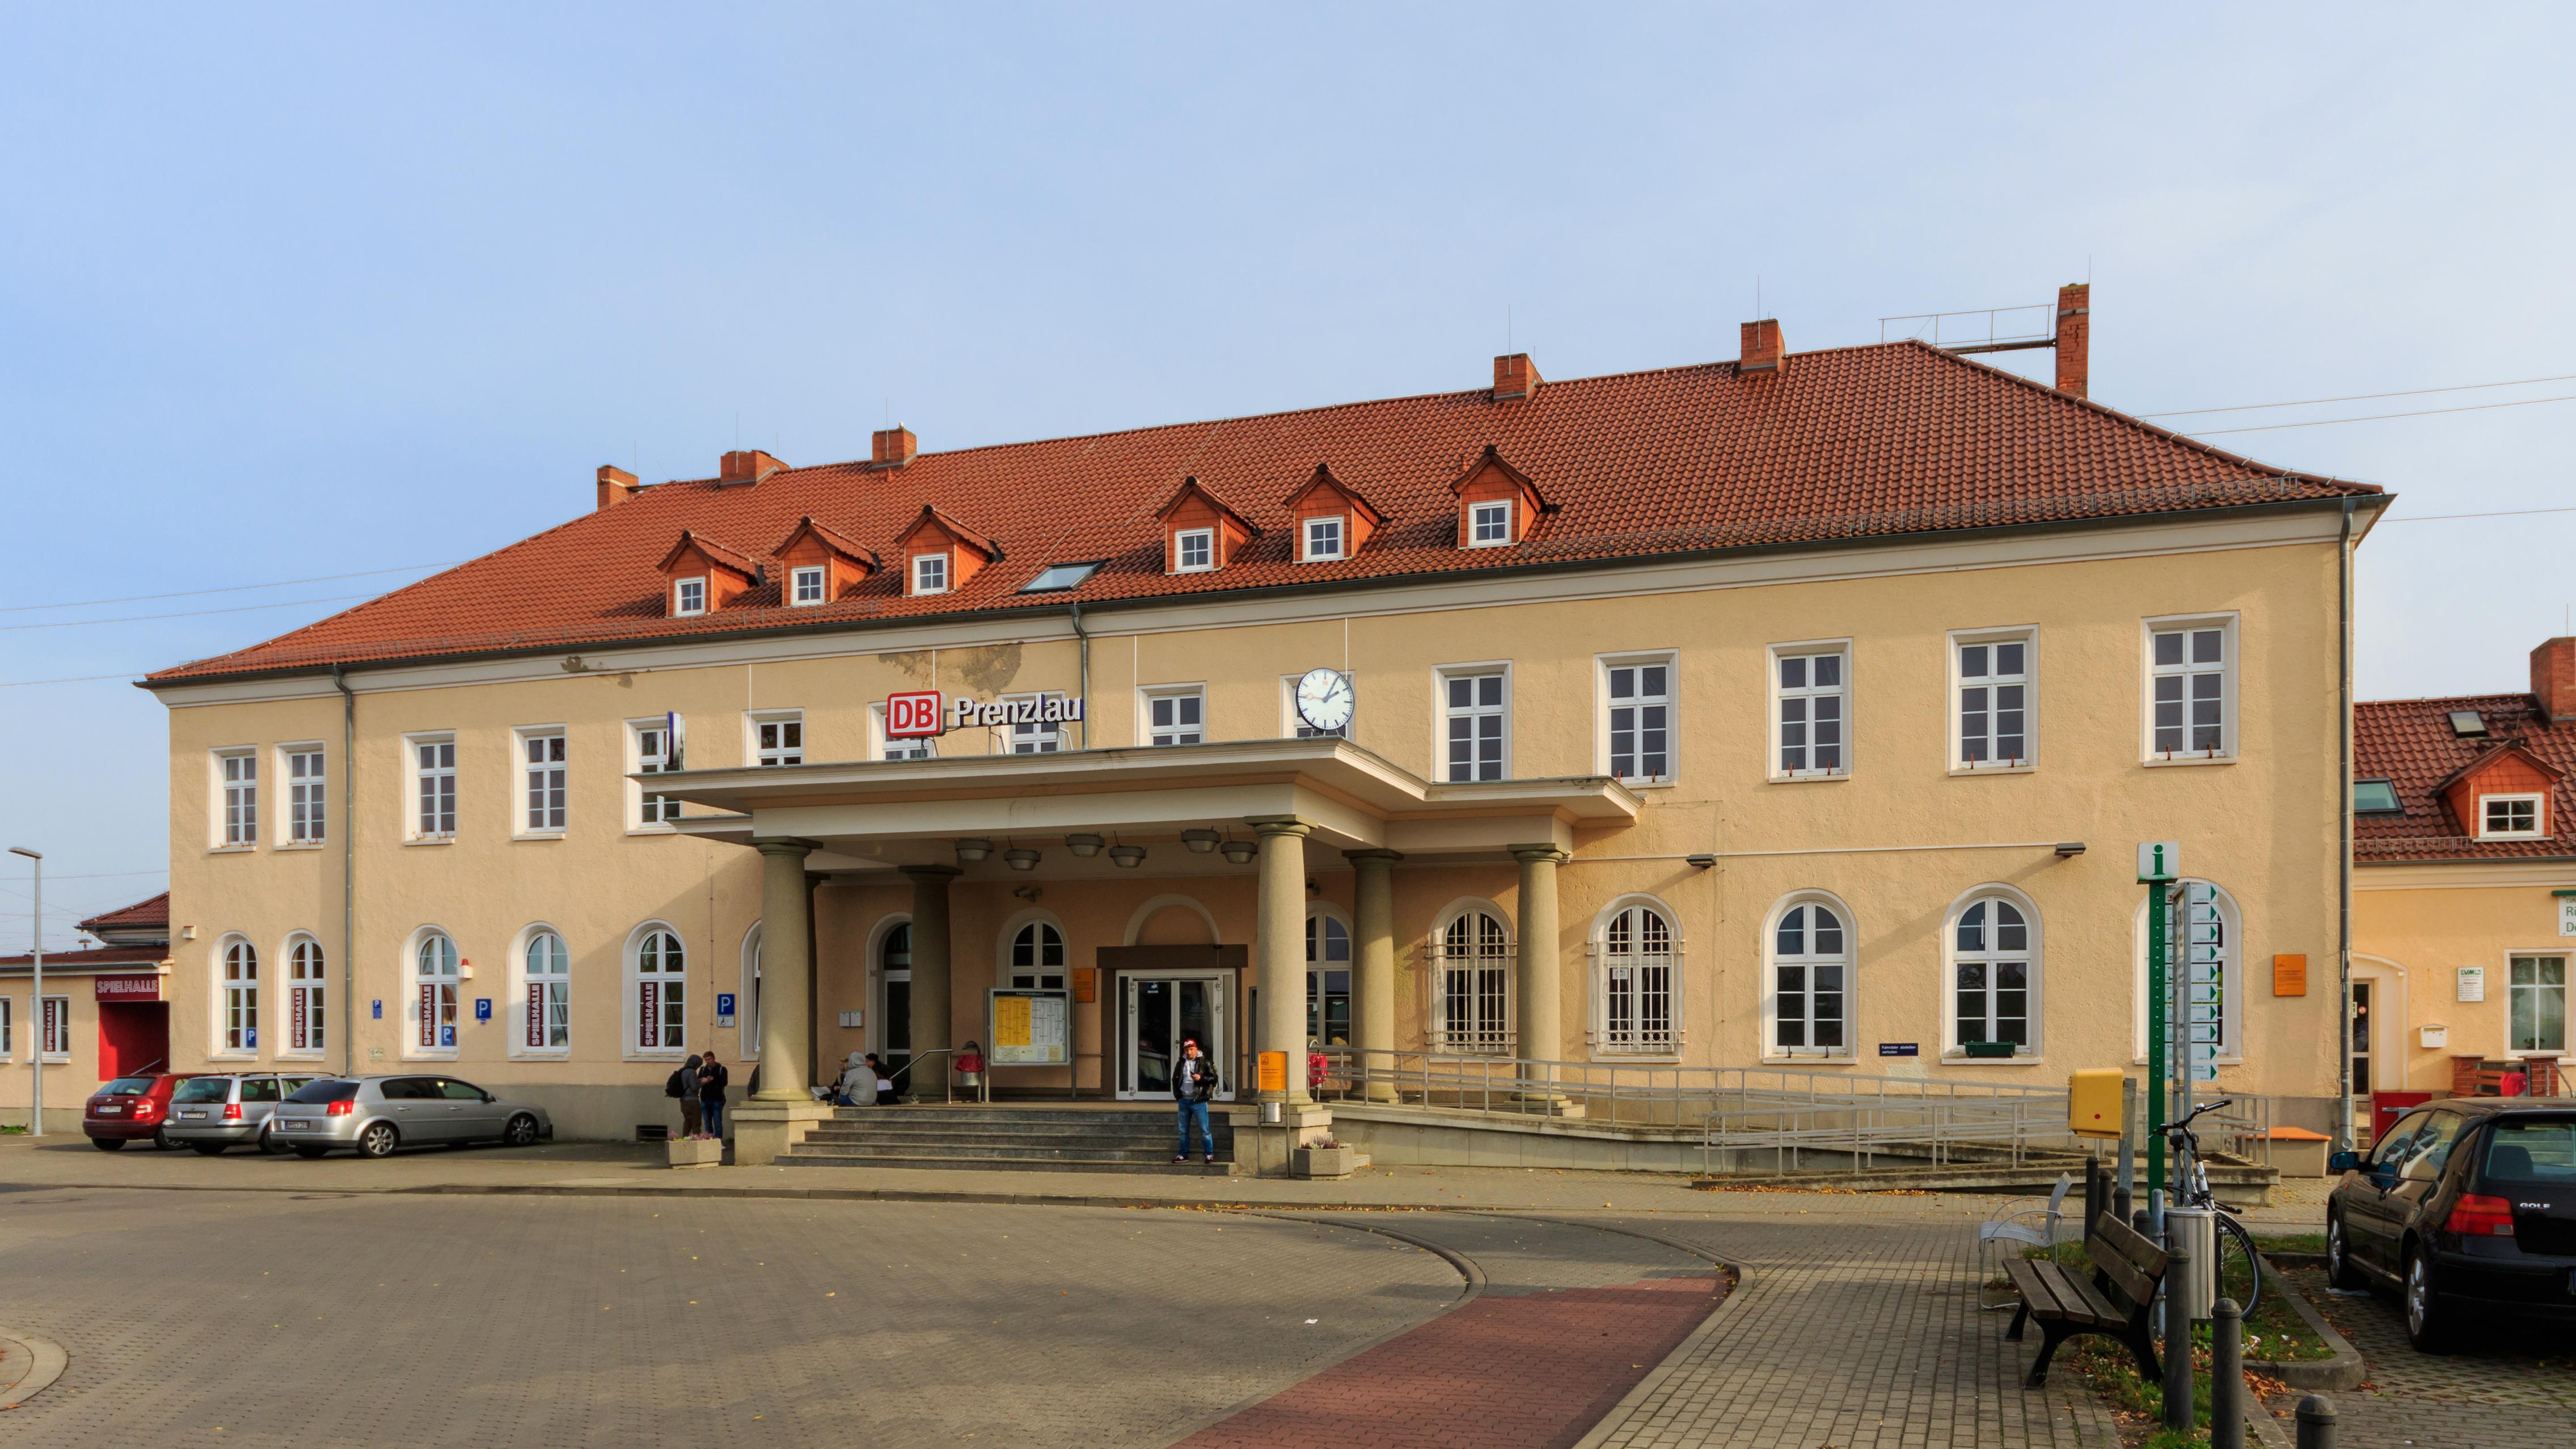 Bahnhof Prenzlau Wikipedia